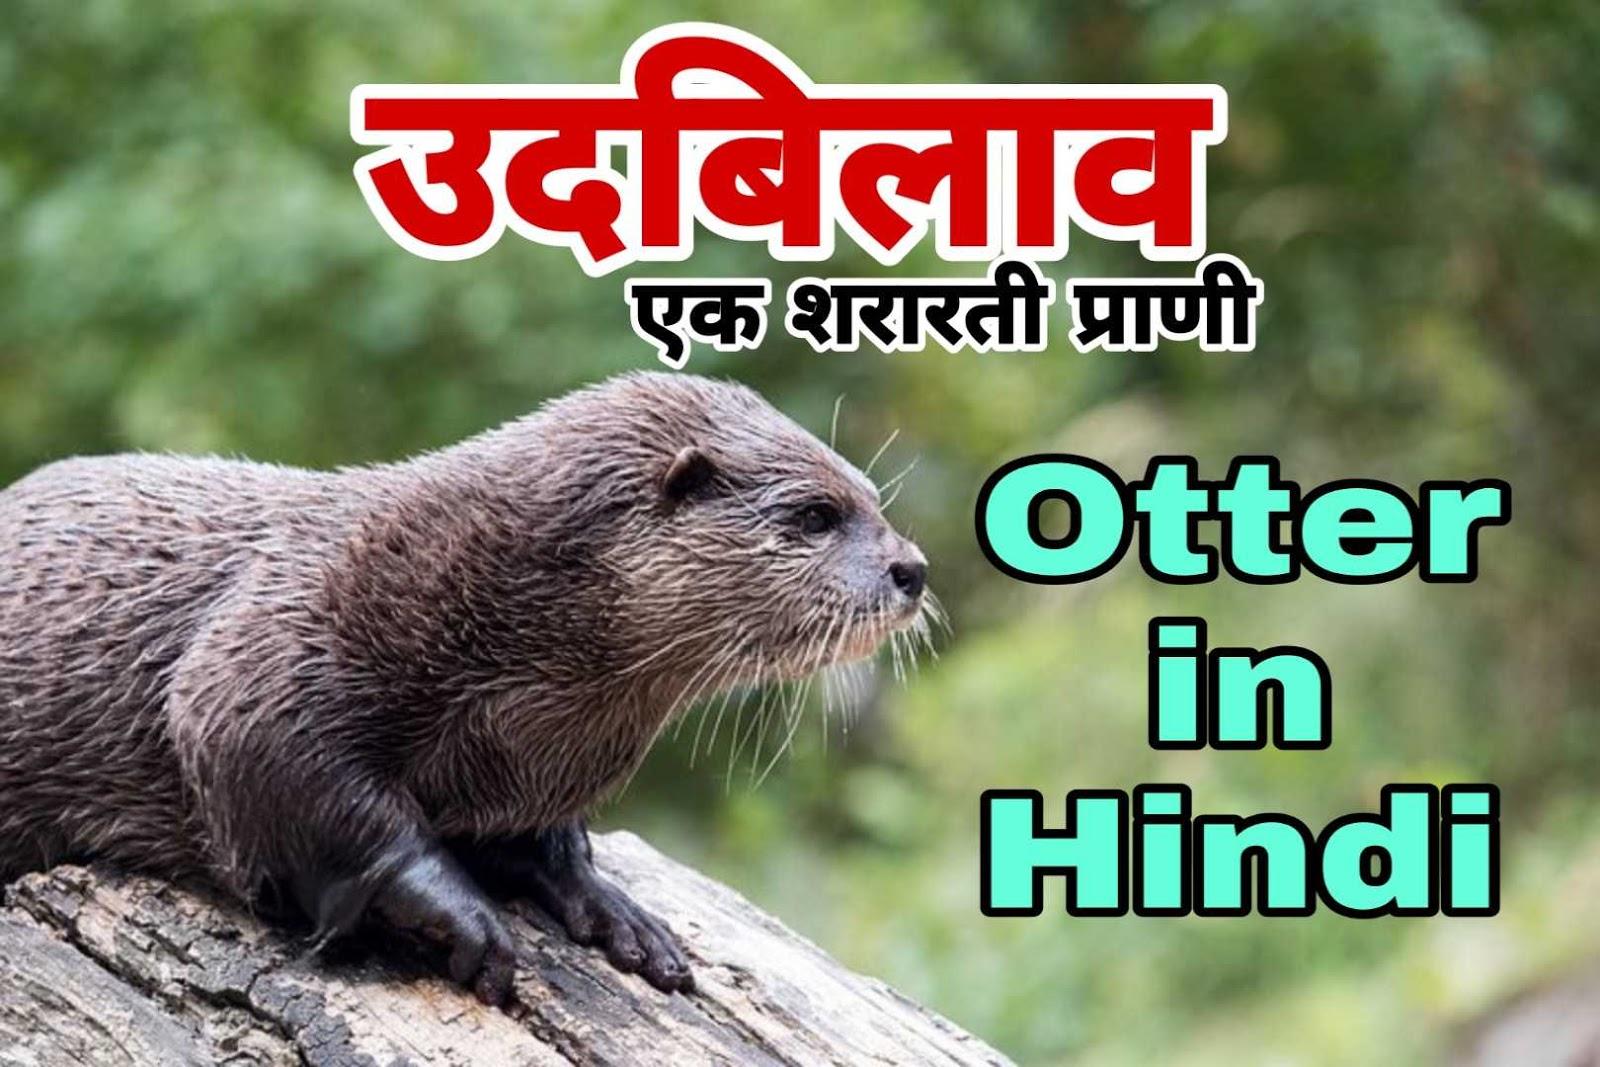 उदबिलाव एक शरारती जानवर - 15 Facts about Otter in Hindi